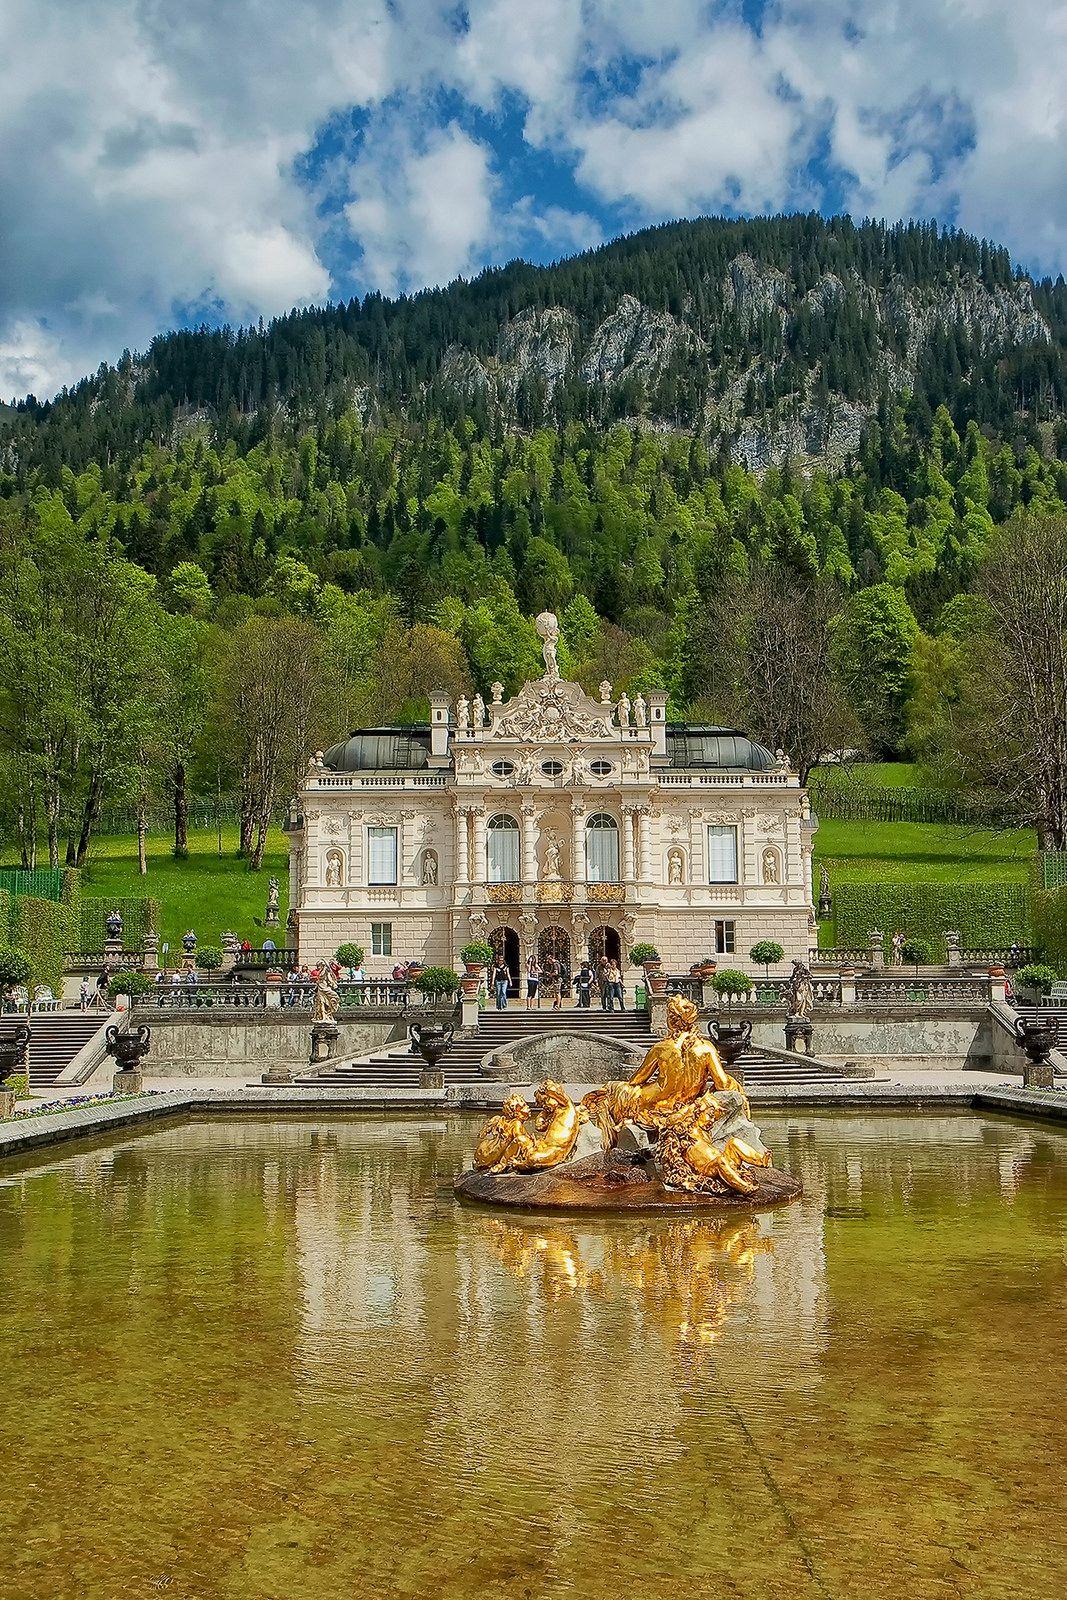 Chateau De Linderhof Baviere Linderhof Palace Germany Castles Scenic Travel